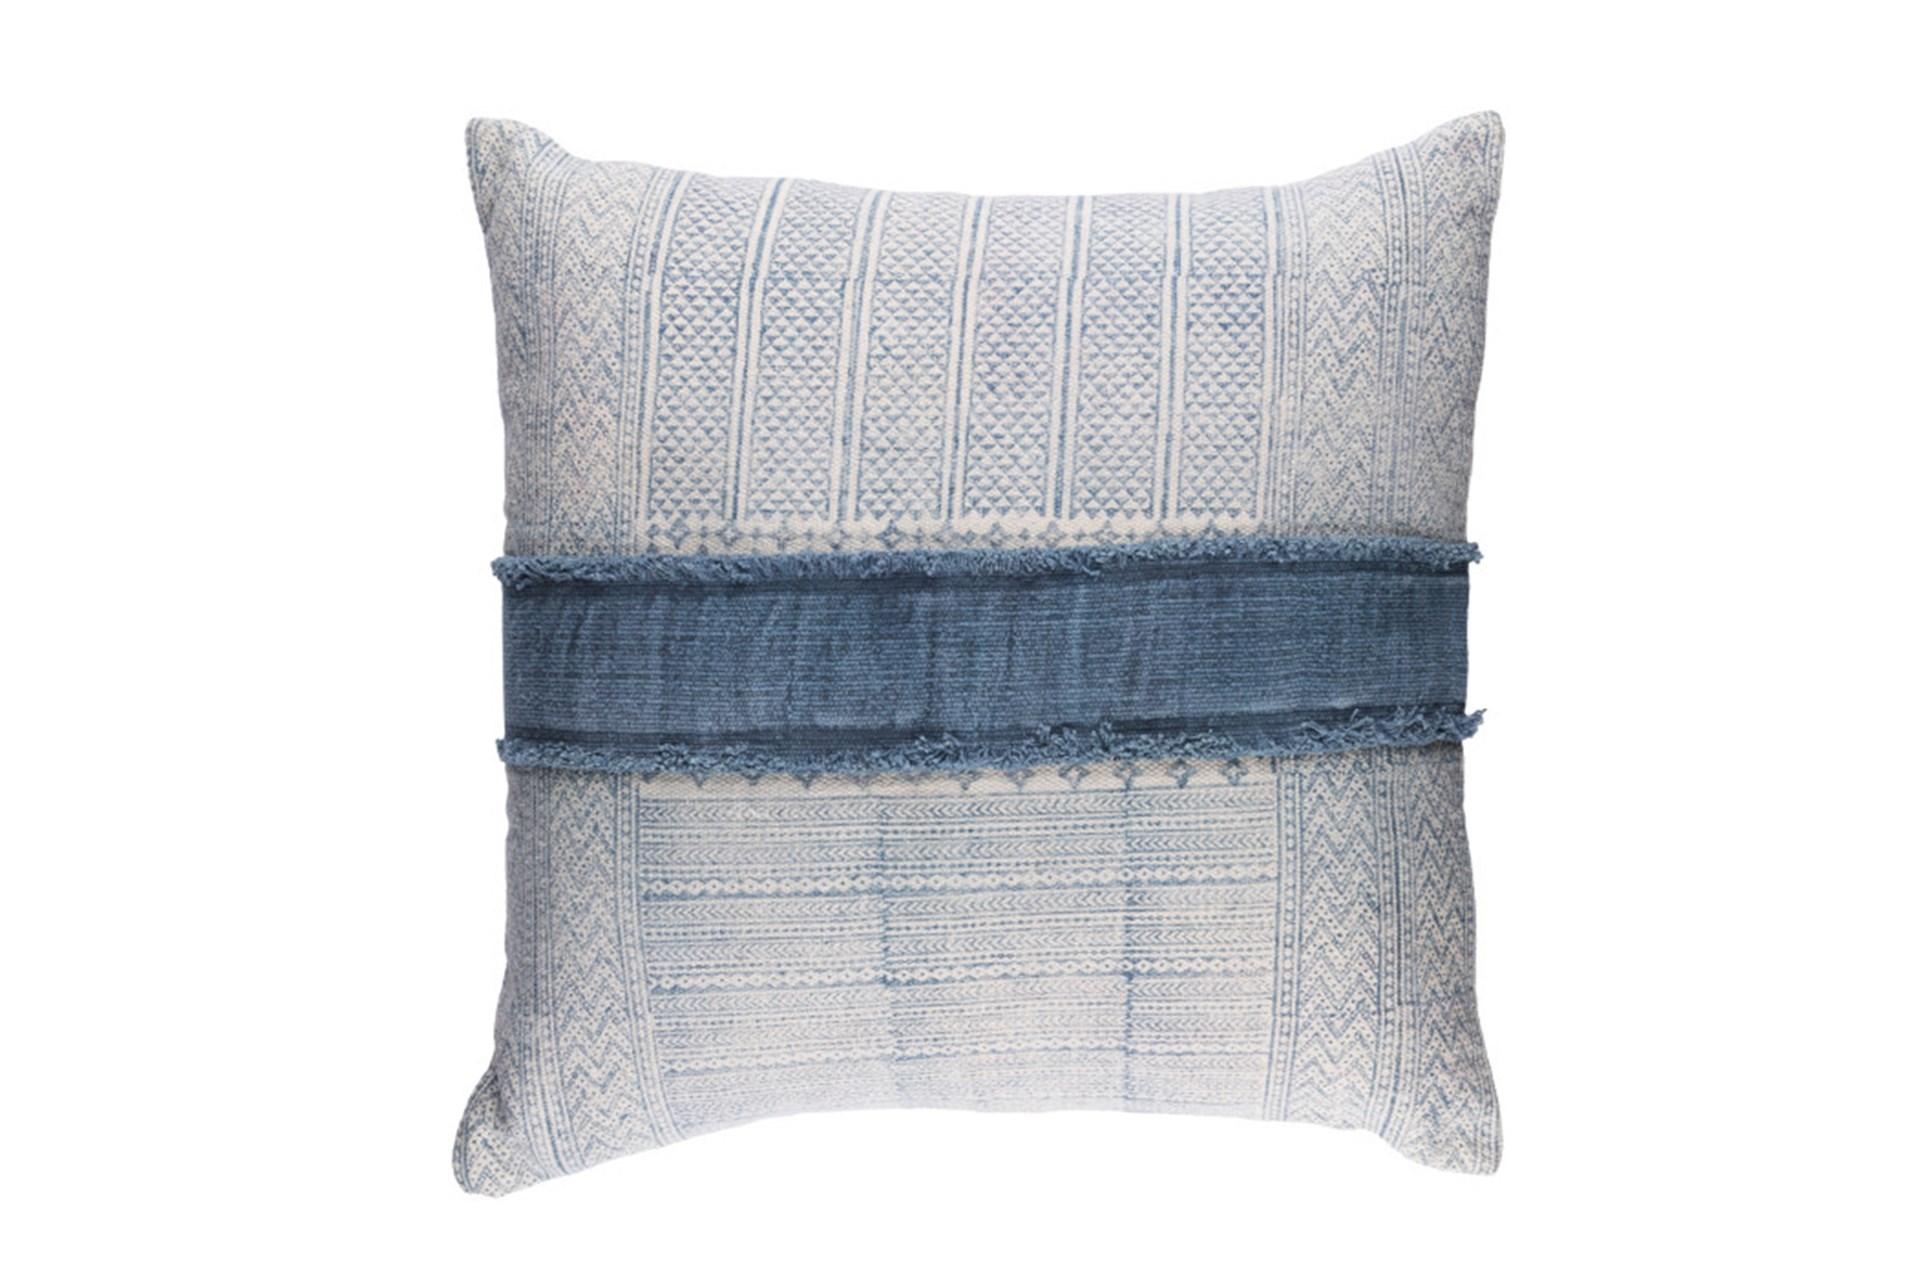 Floor Pillow Insert 30 X 30 : Floor Pillow-Borough Indigo Distressed 30X30 Living Spaces